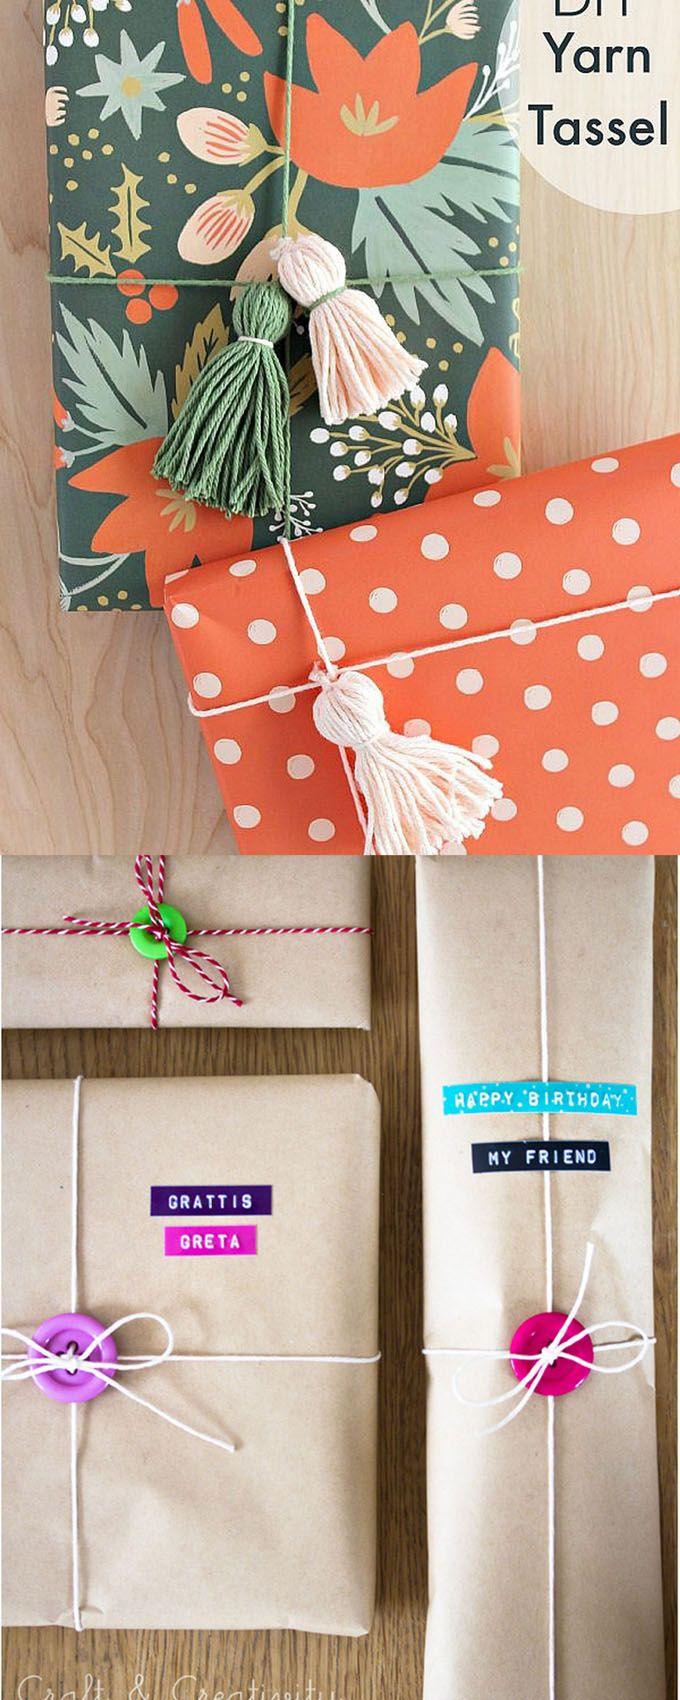 1148 best DIY images on Pinterest | Christmas presents, Creative ...